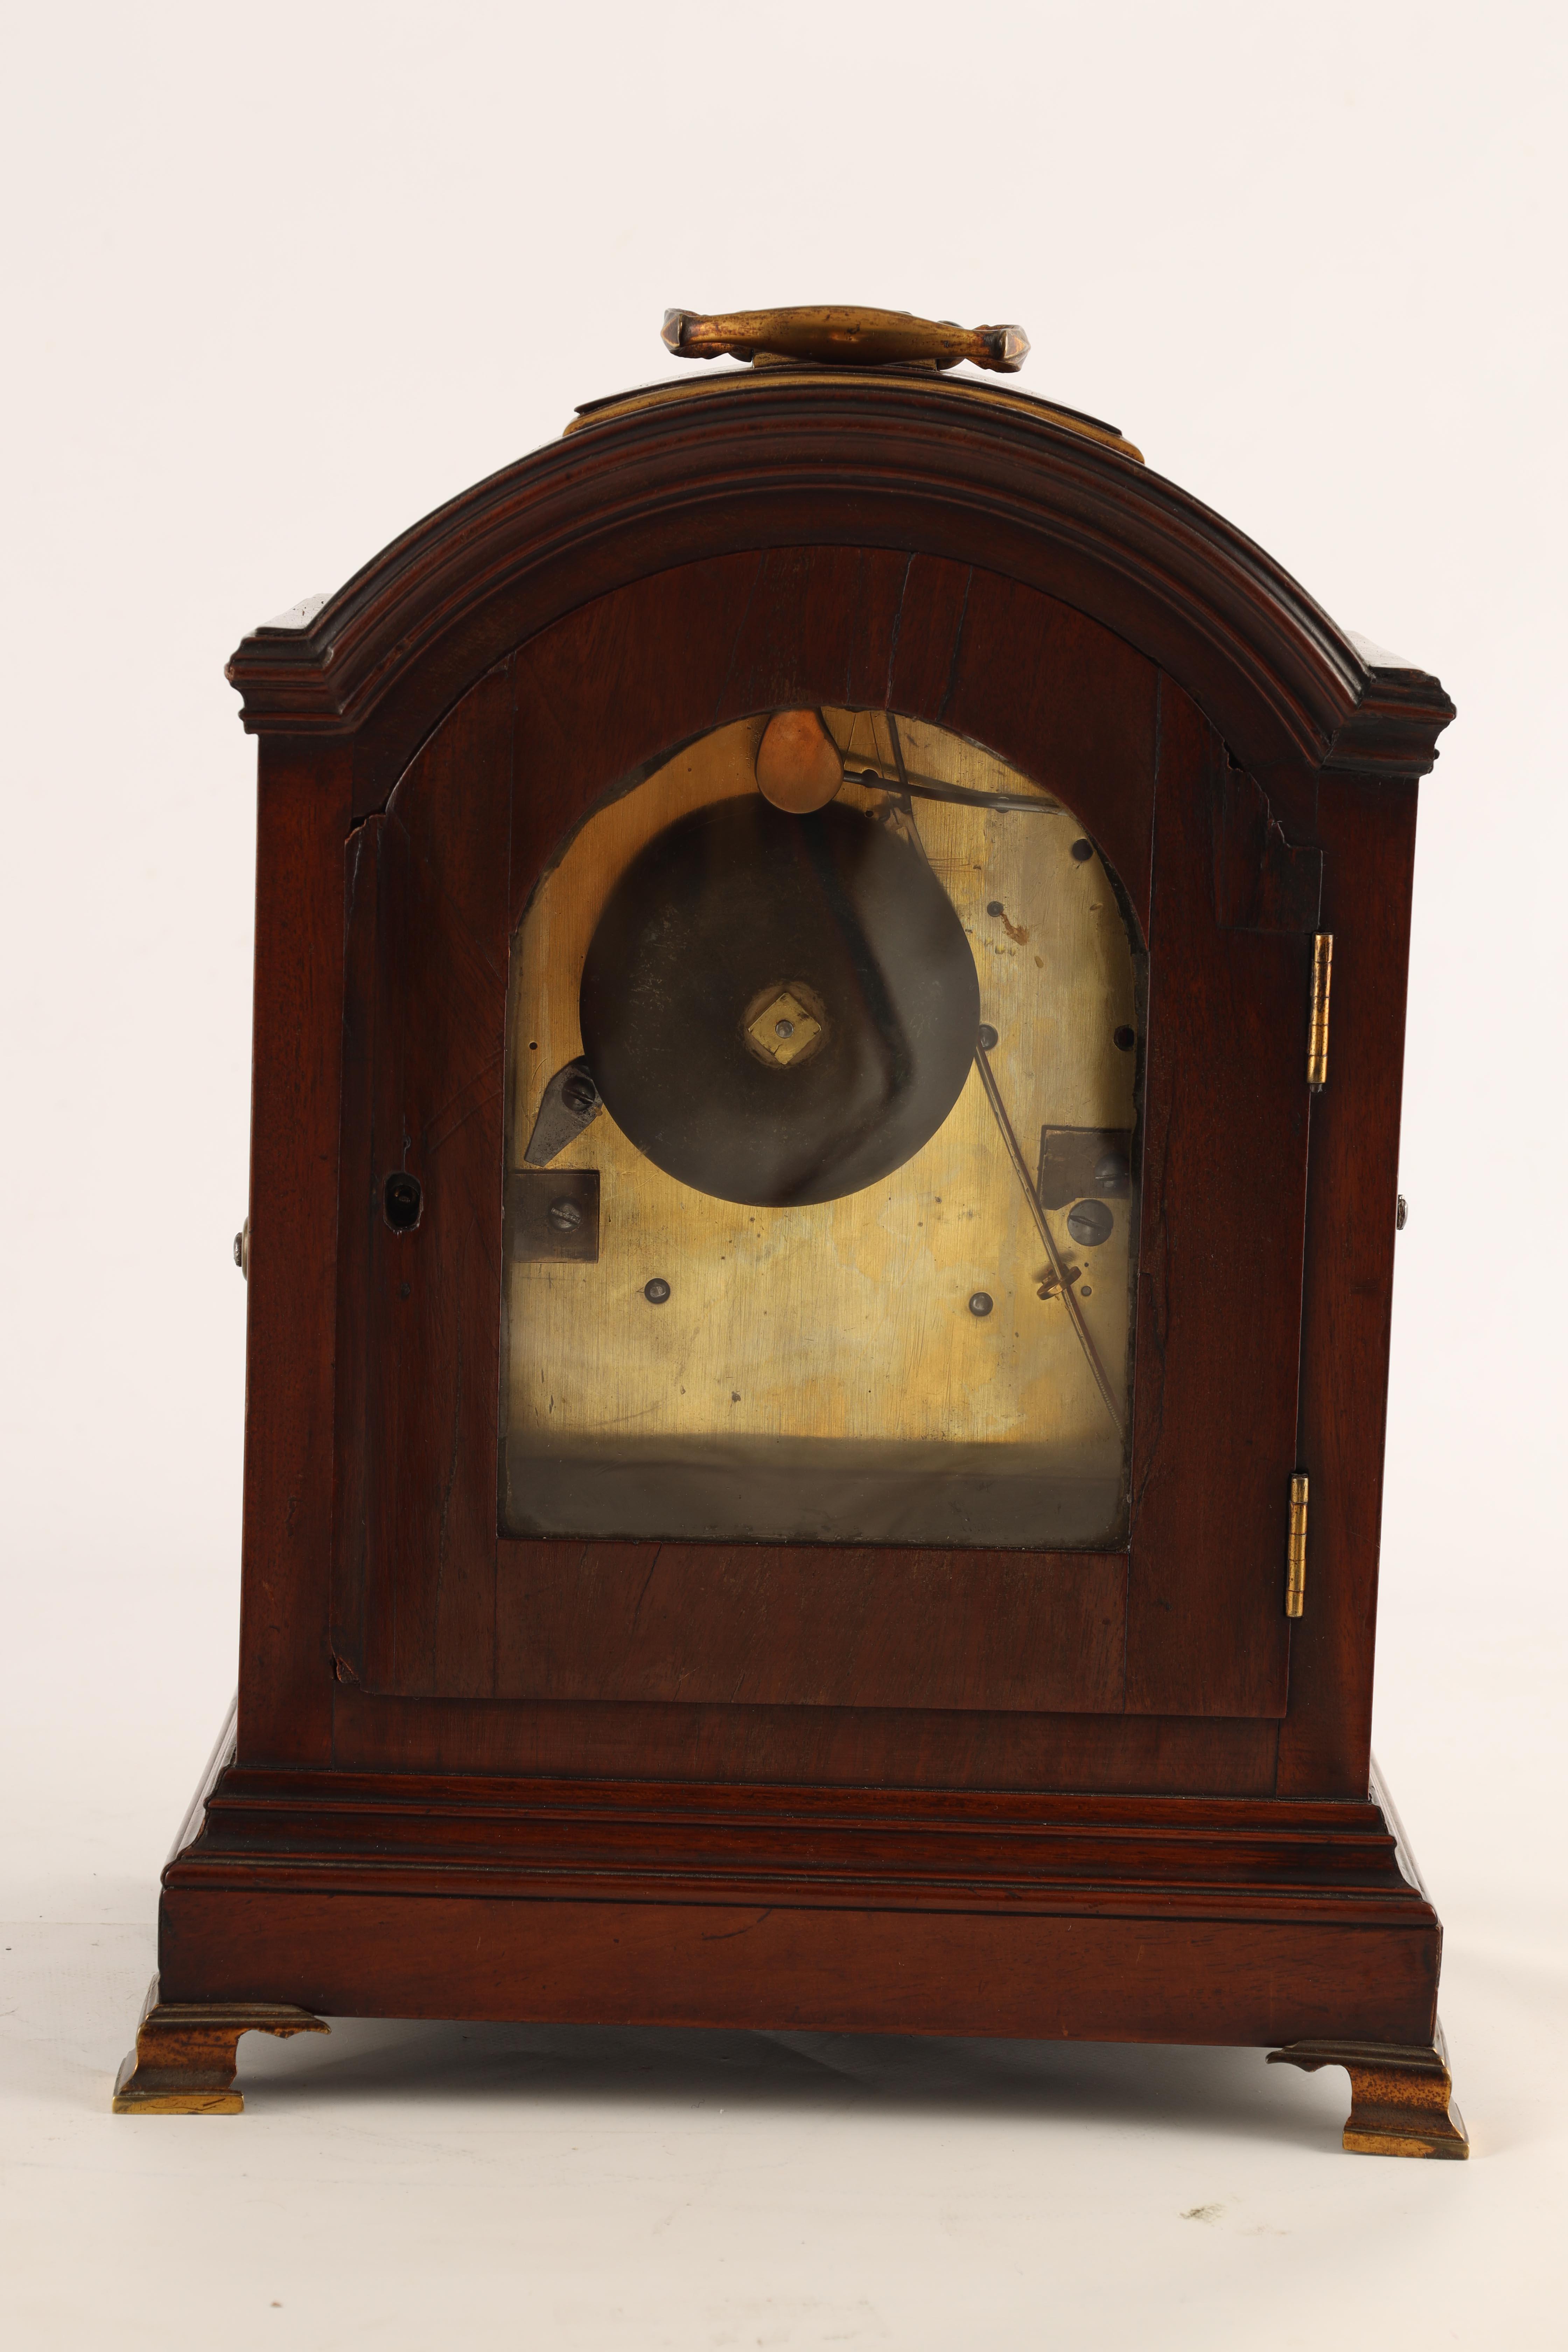 JOHN DOBBS, LONDON A LATE GEORGE III MAHOGANY VERGE BRACKET CLOCK the figured mahogany case with - Image 7 of 8